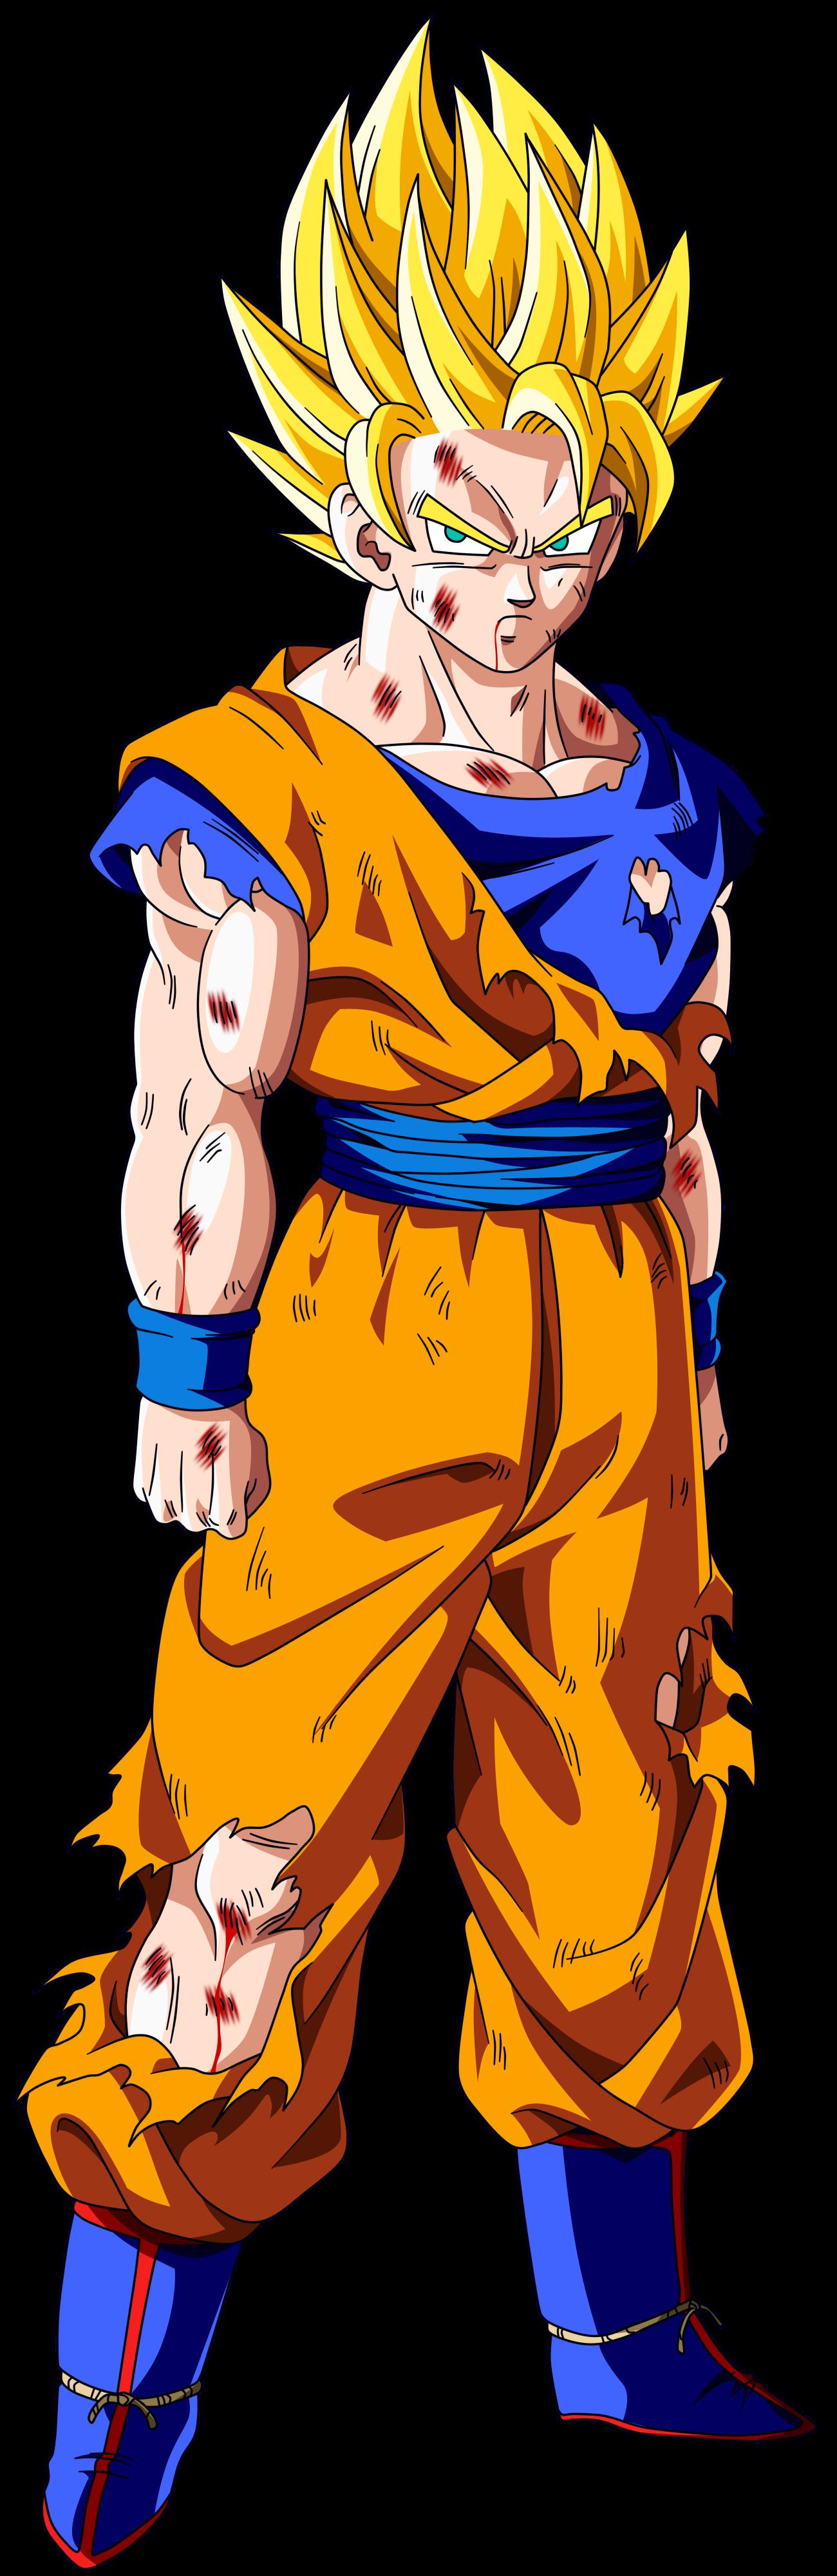 Goku ssj childhood pinterest goku dragon ball y - Sangoku super sayen 2 ...